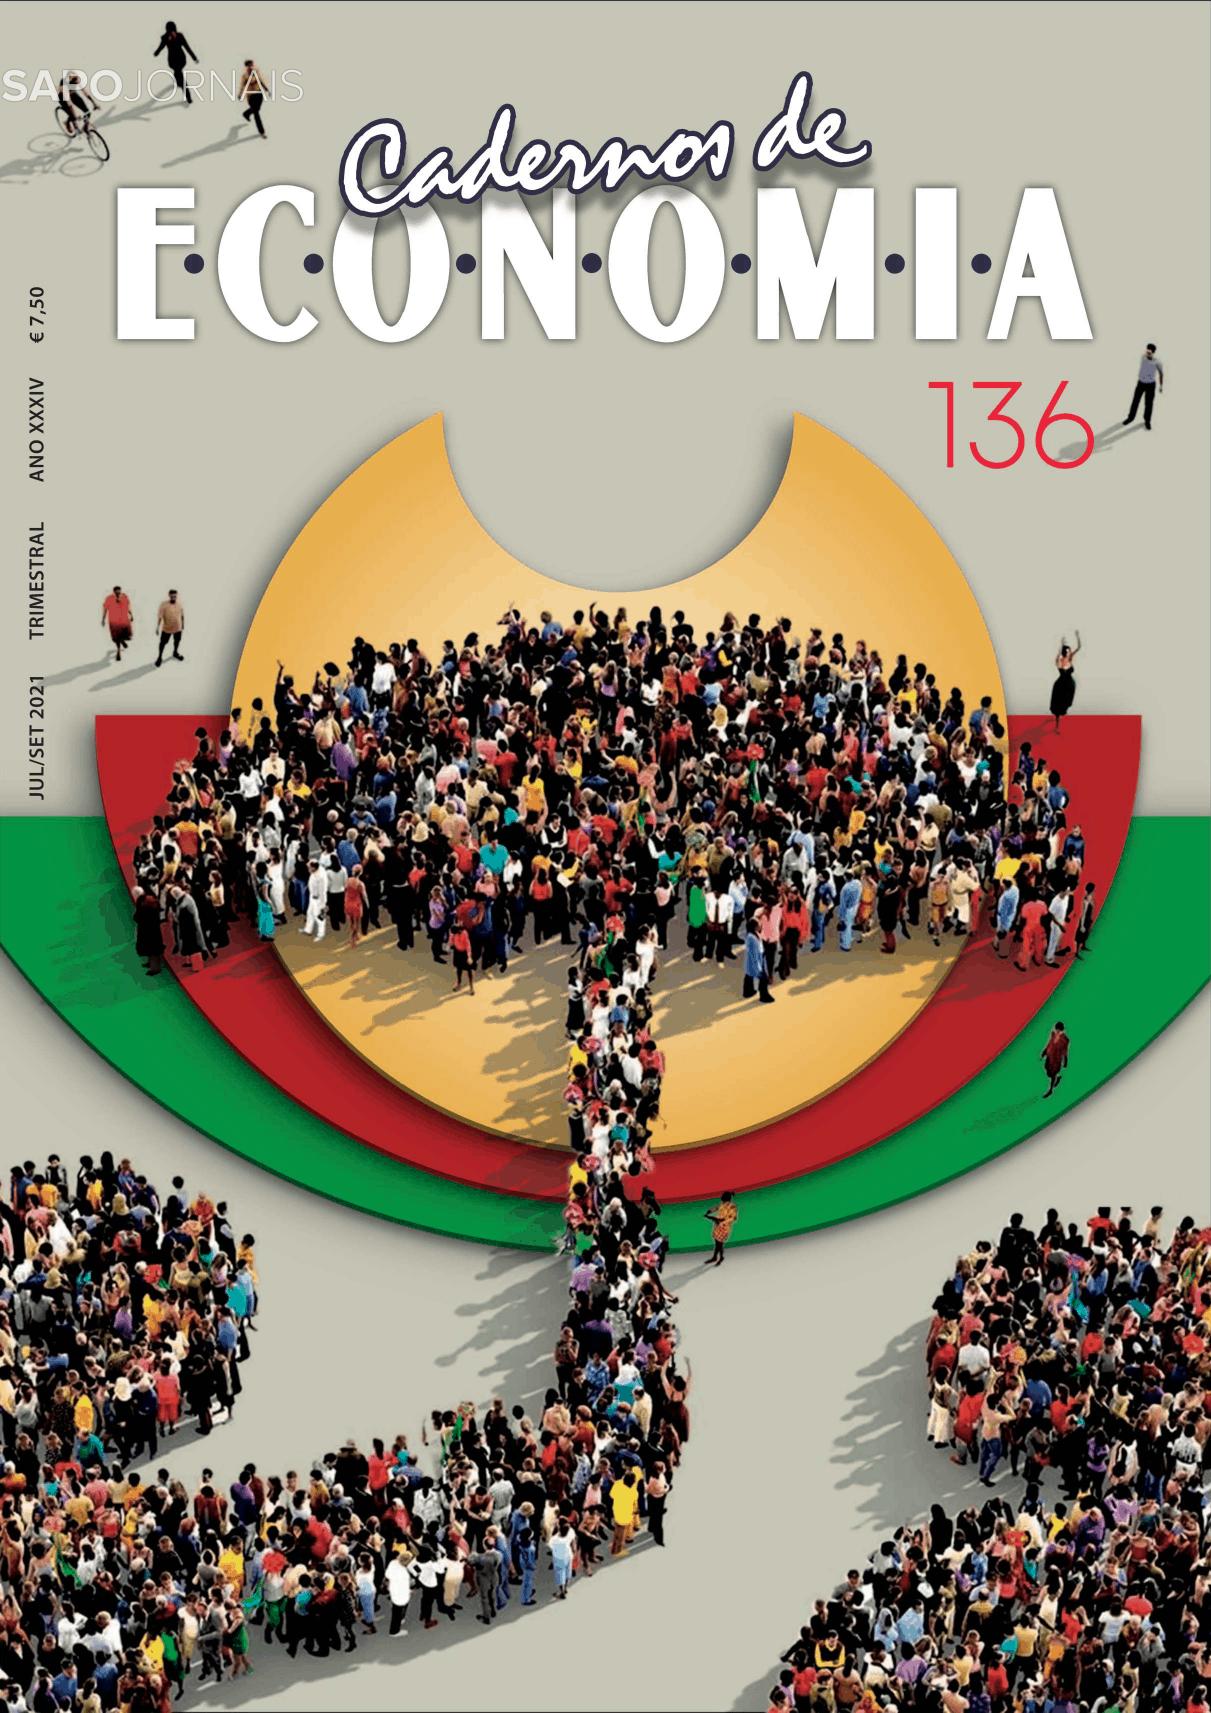 Cadernos de Economia